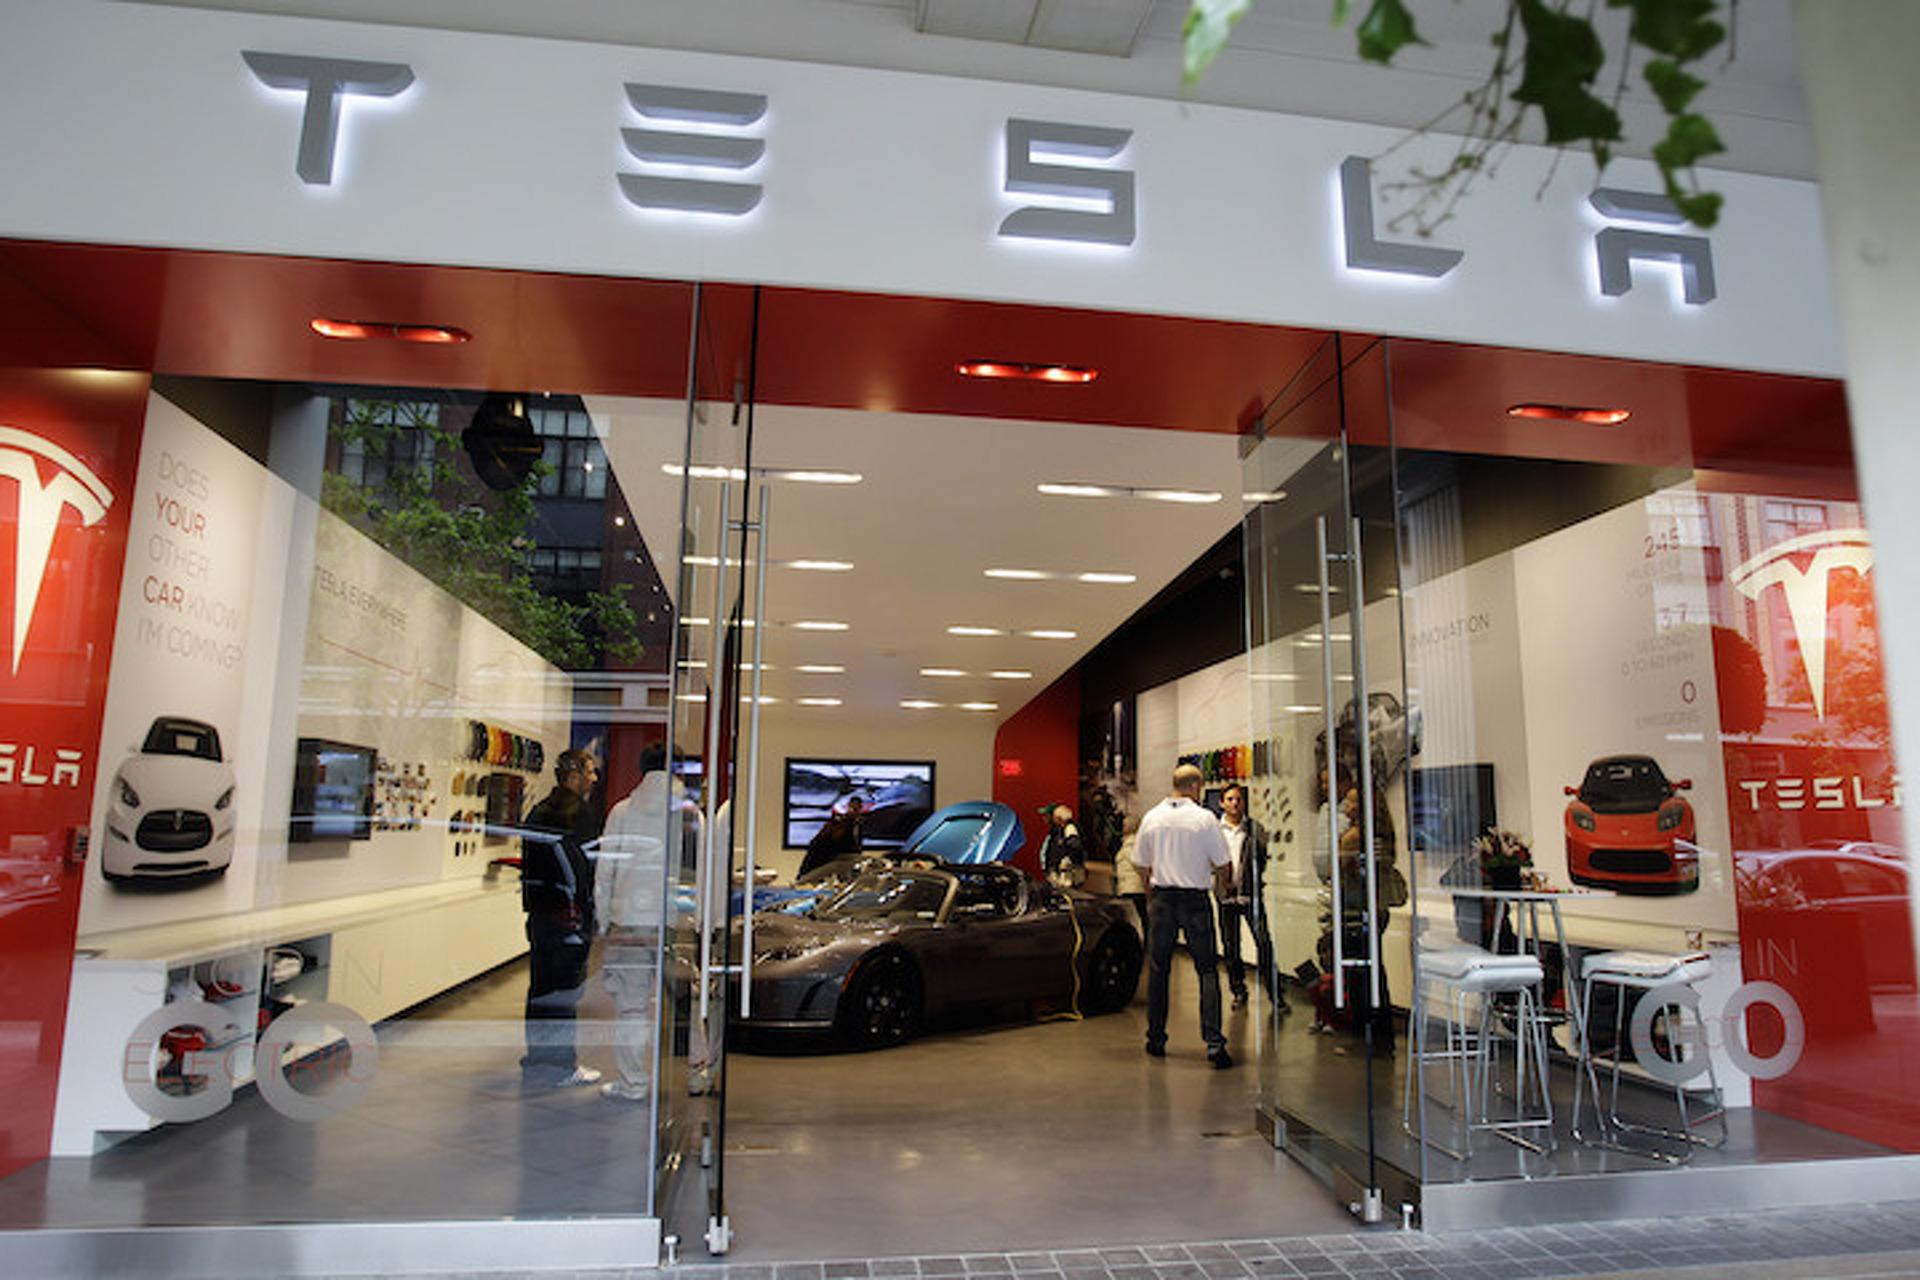 Missouri Looking to Ban Tesla Direct Sales, But Tesla Fights Back